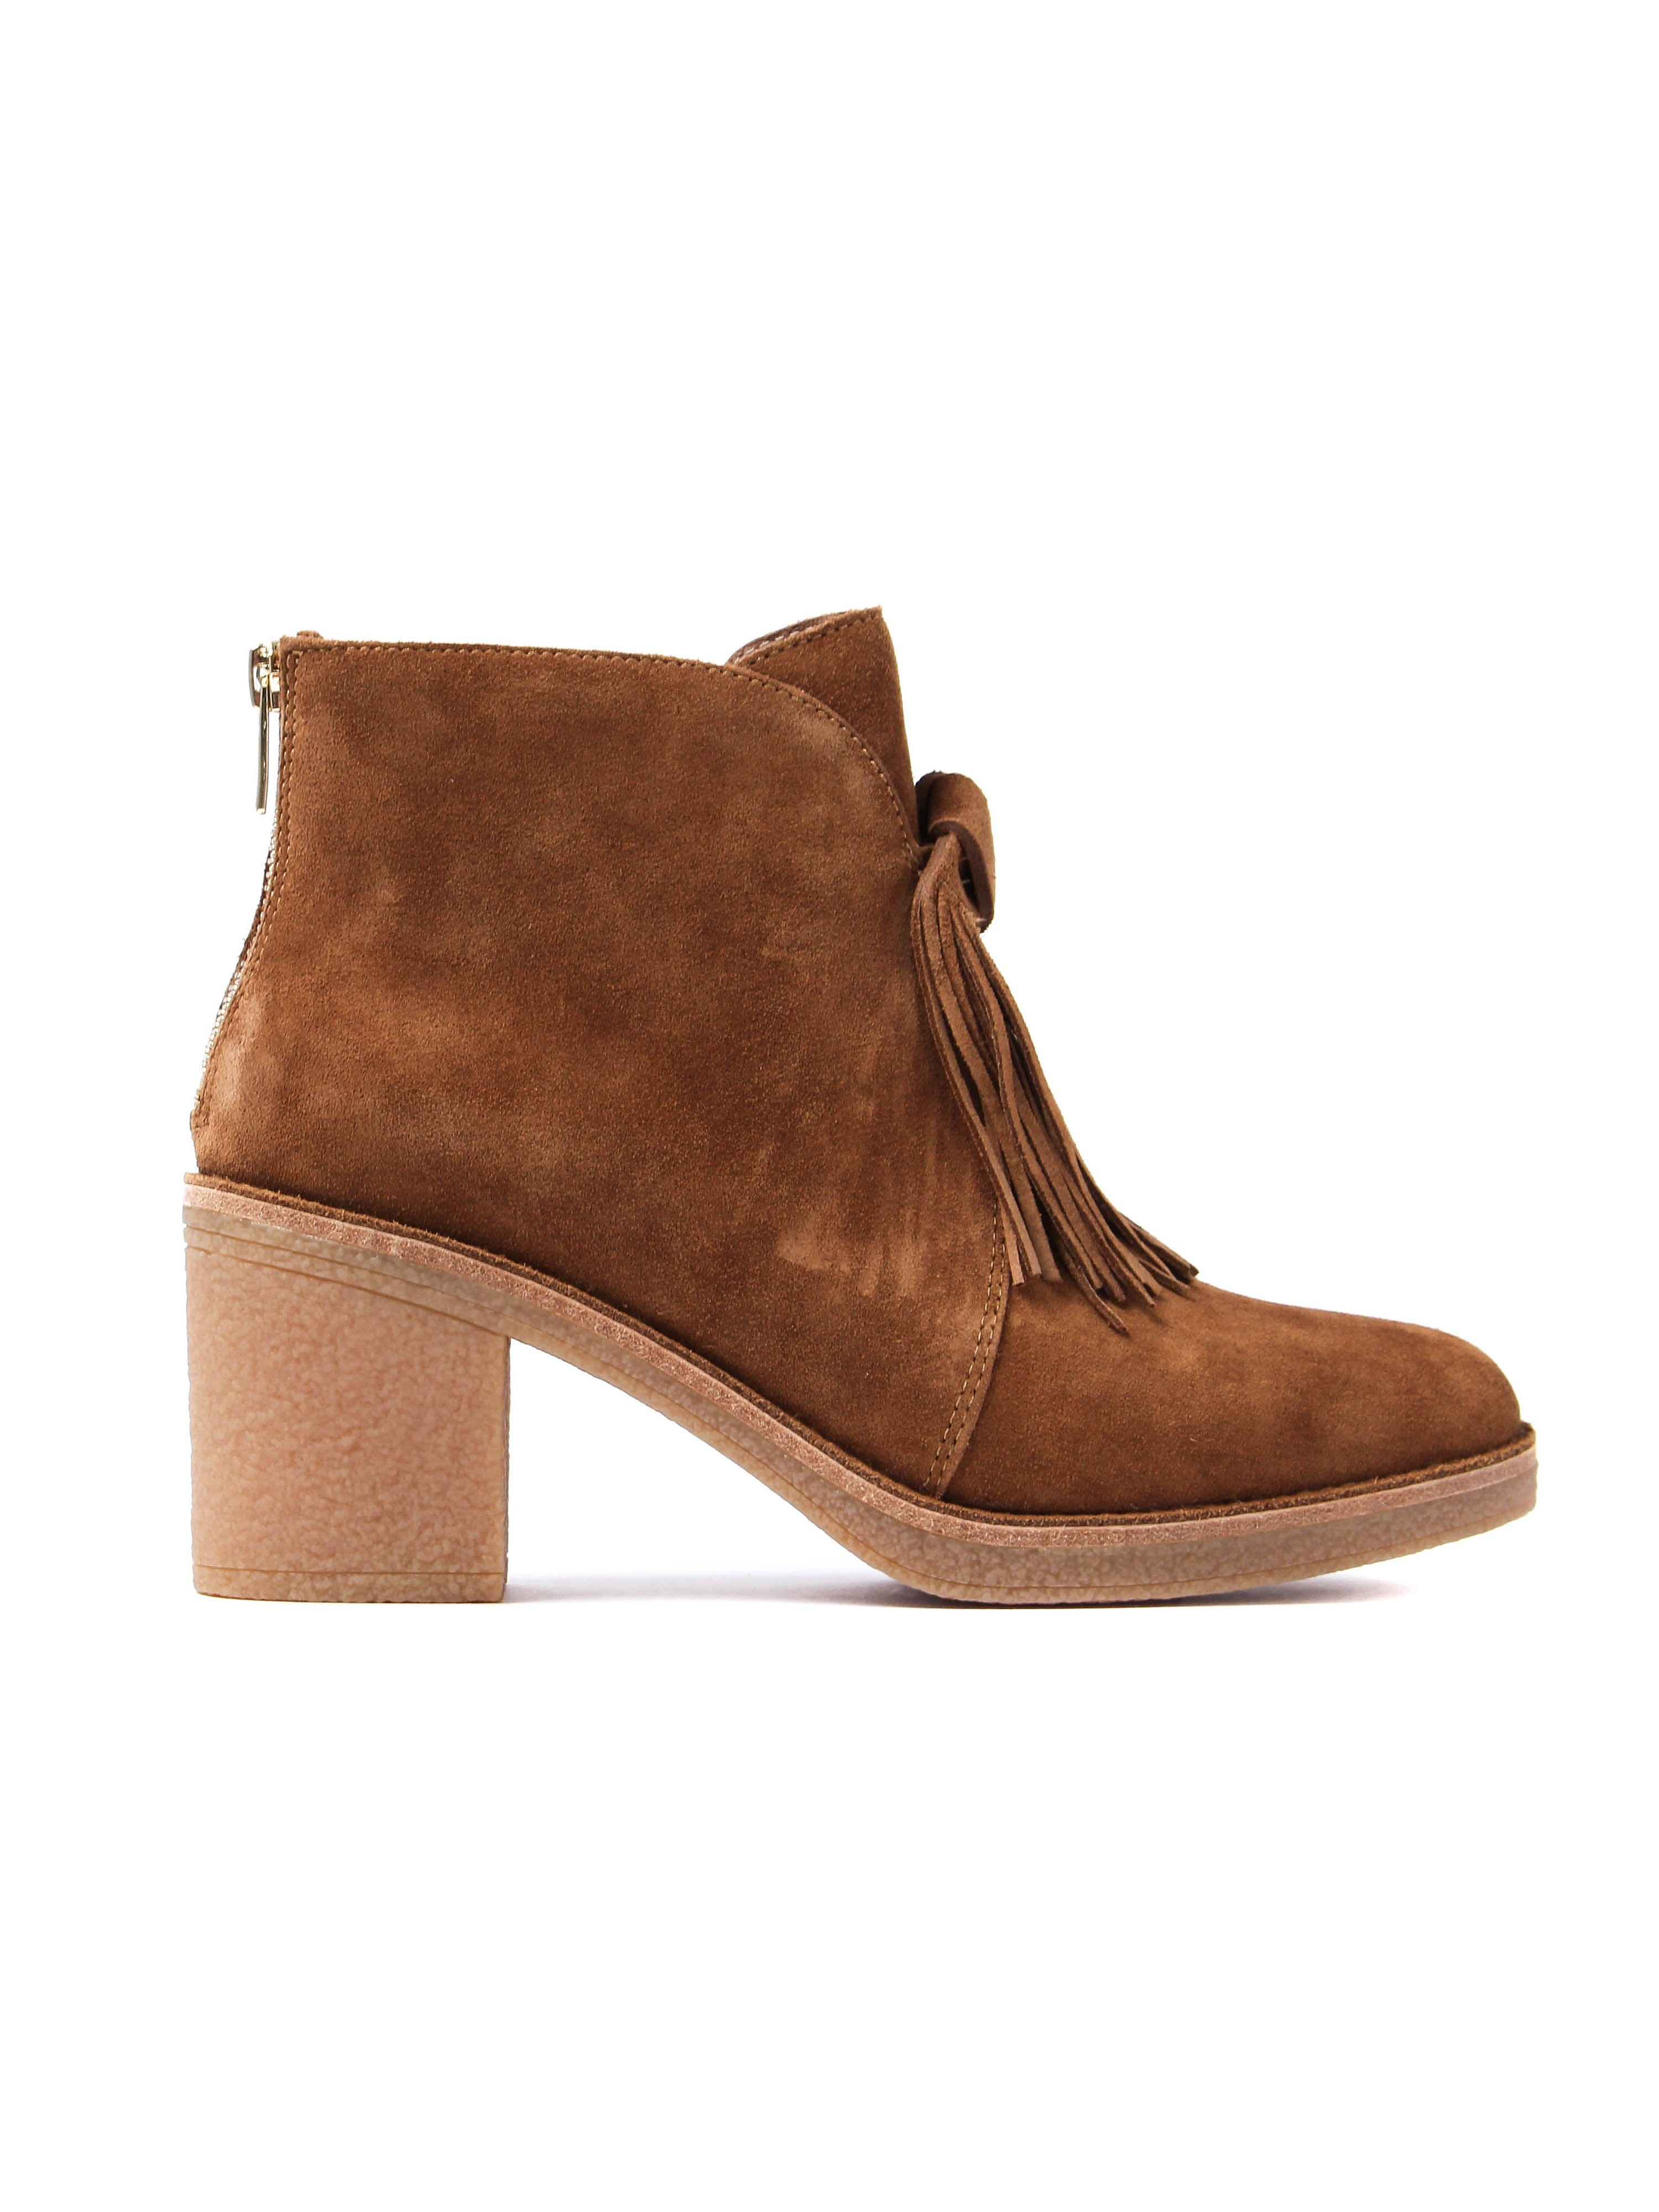 UGG Women's Corin Boots - Chestnut